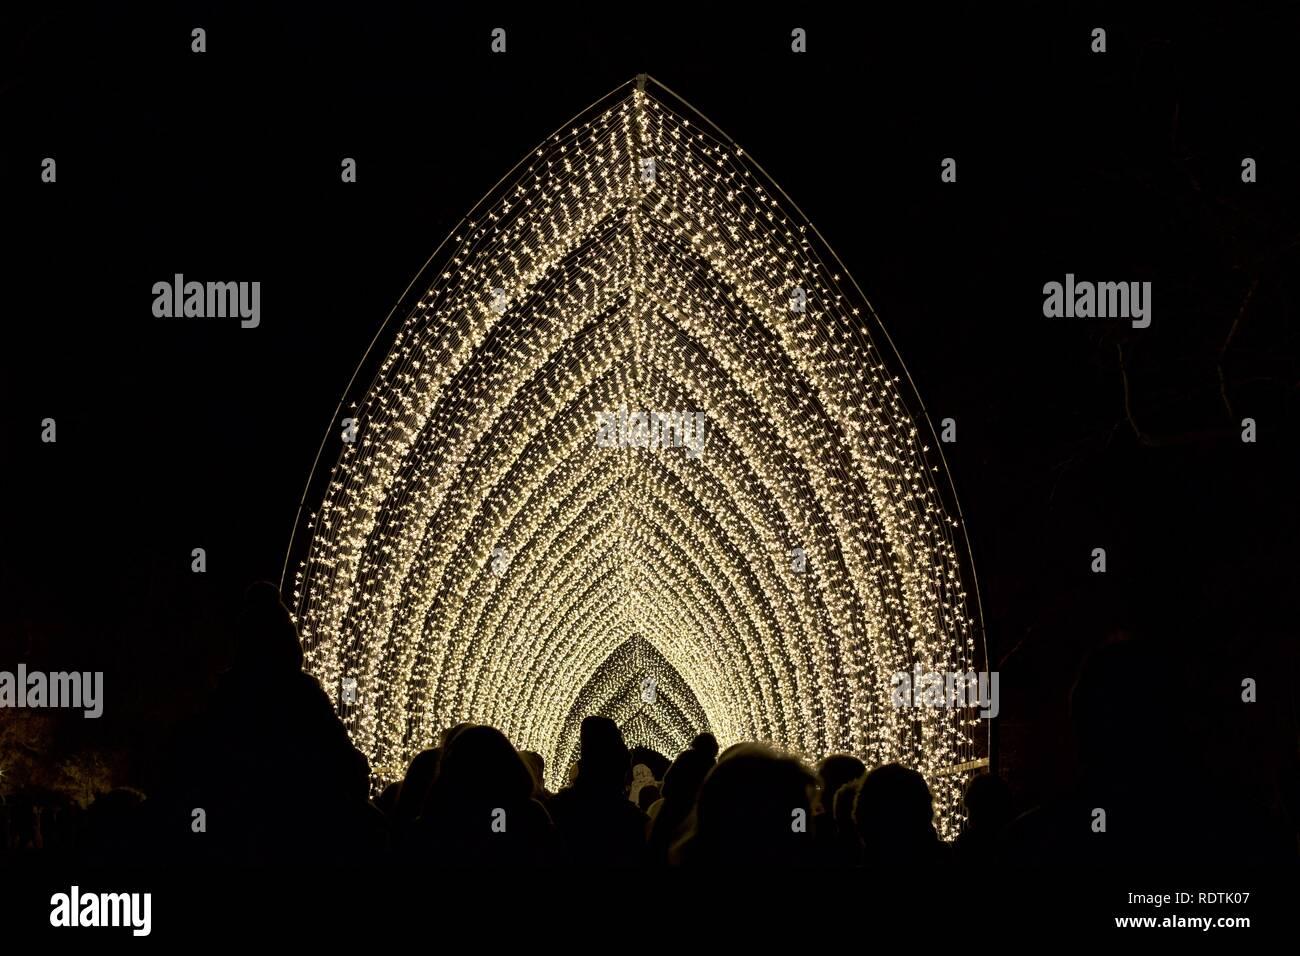 100m long Cathedral of Light at Christmas at Kew Gardens 2018 - Stock Image